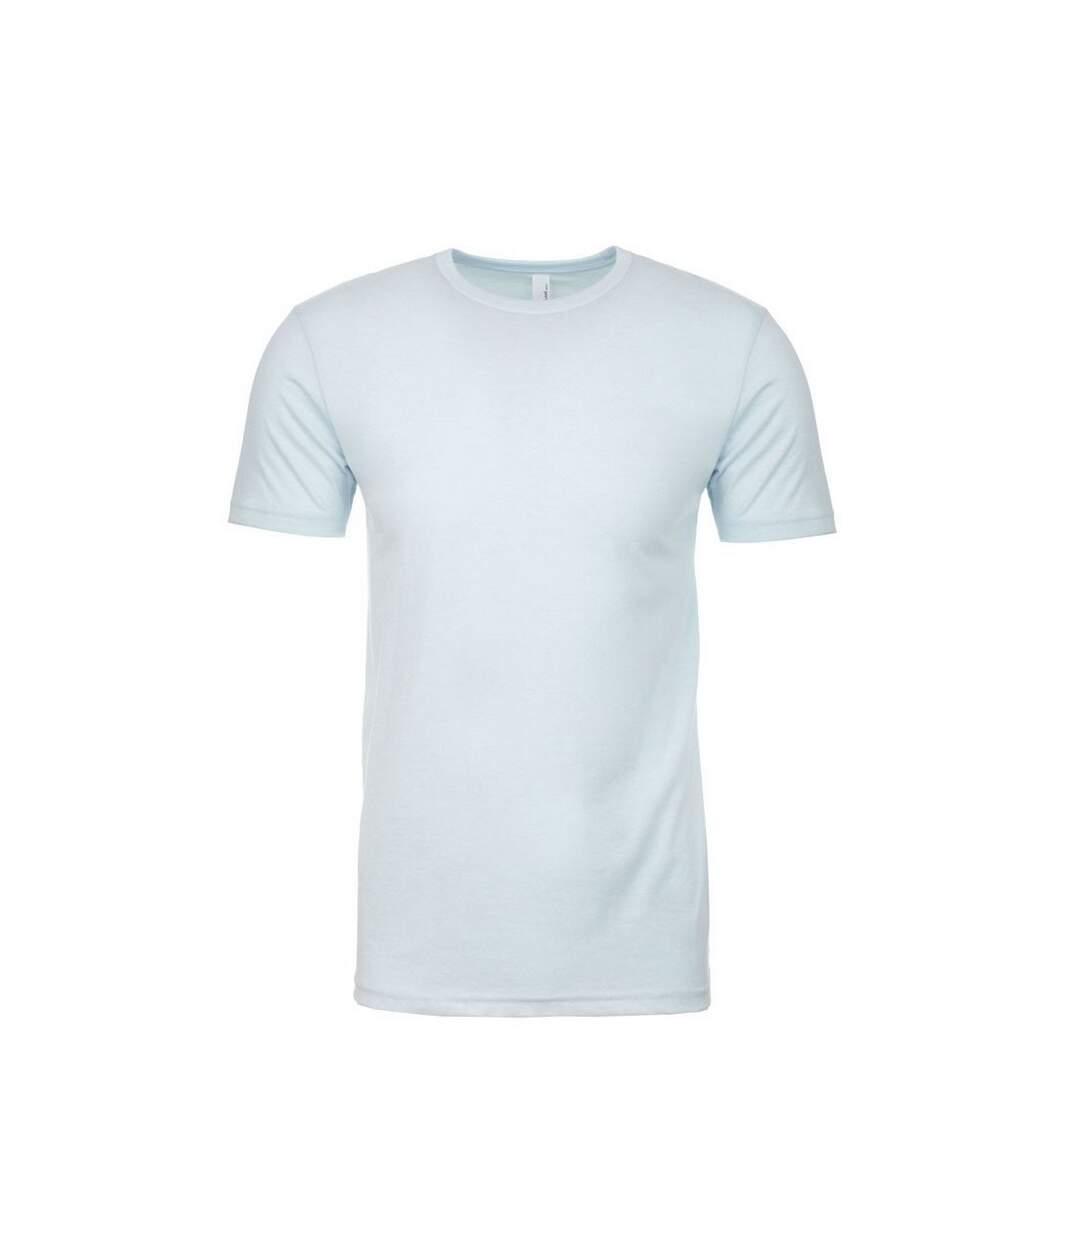 Next Level Adults Unisex CVC Crew Neck T-Shirt (Ice Blue) - UTPC3480